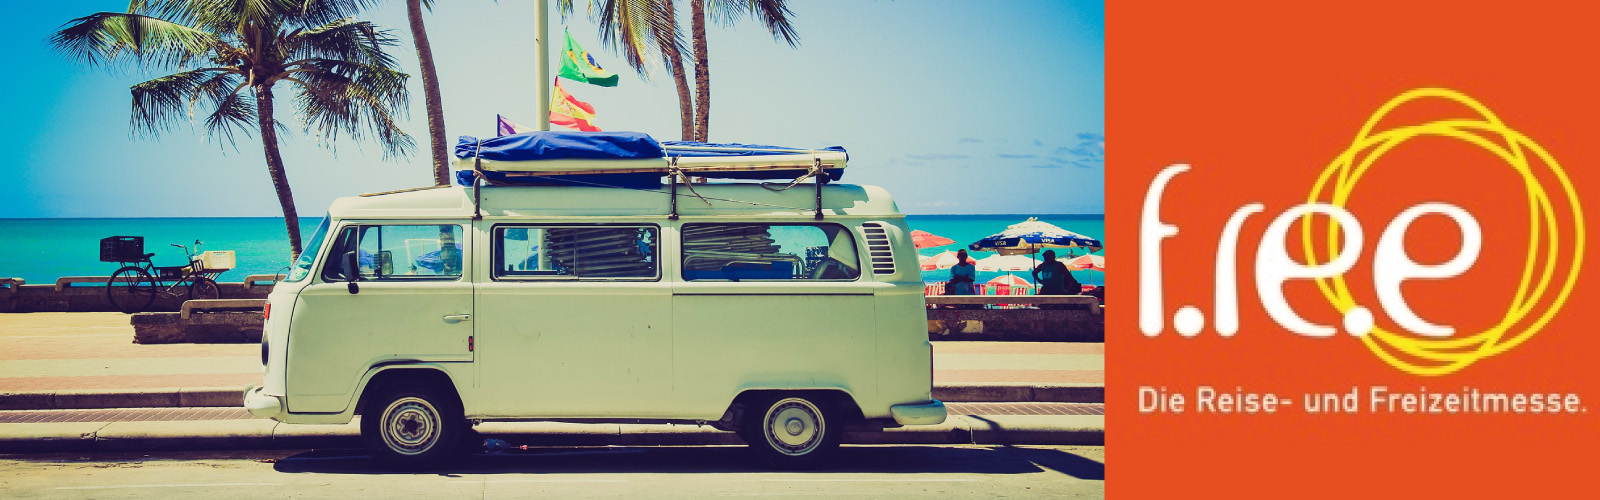 messe free m nchen 2018 caravan wiedemann wohnmobil h ndler. Black Bedroom Furniture Sets. Home Design Ideas